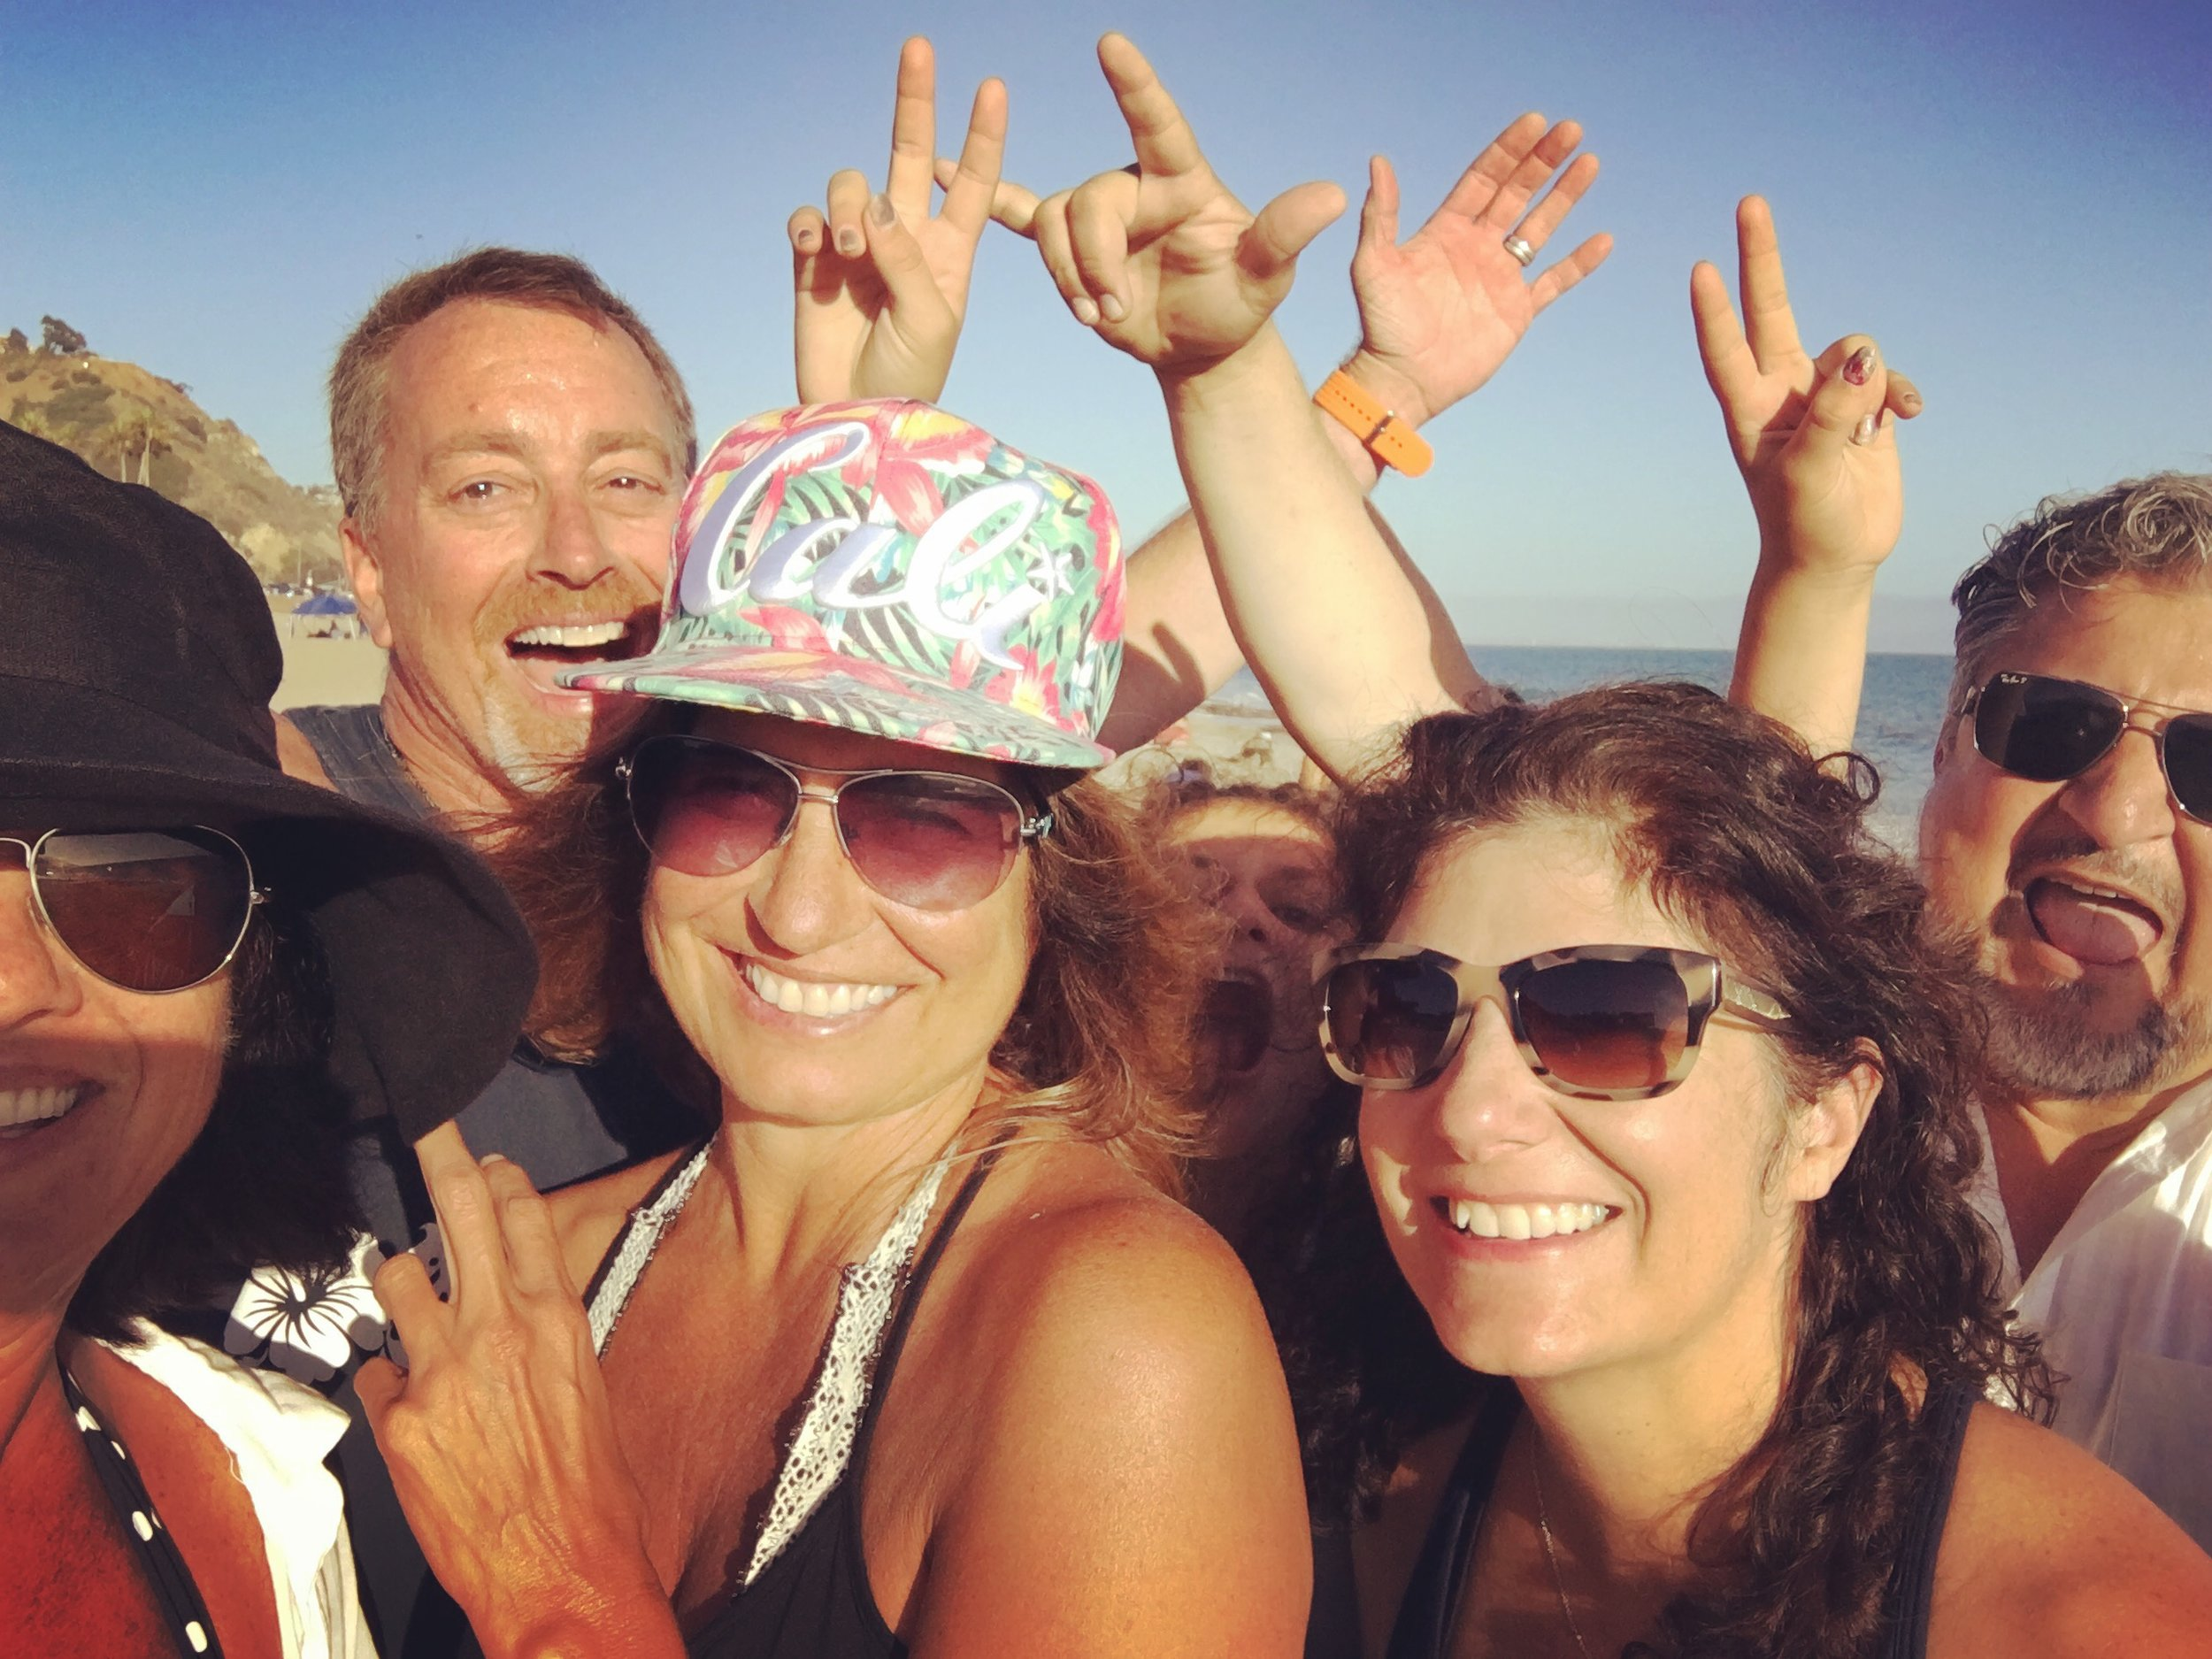 L-R: Me, Scott, Kacy, Sophia, Stephanie + Bert Pacific Palisades, CA - July 2016